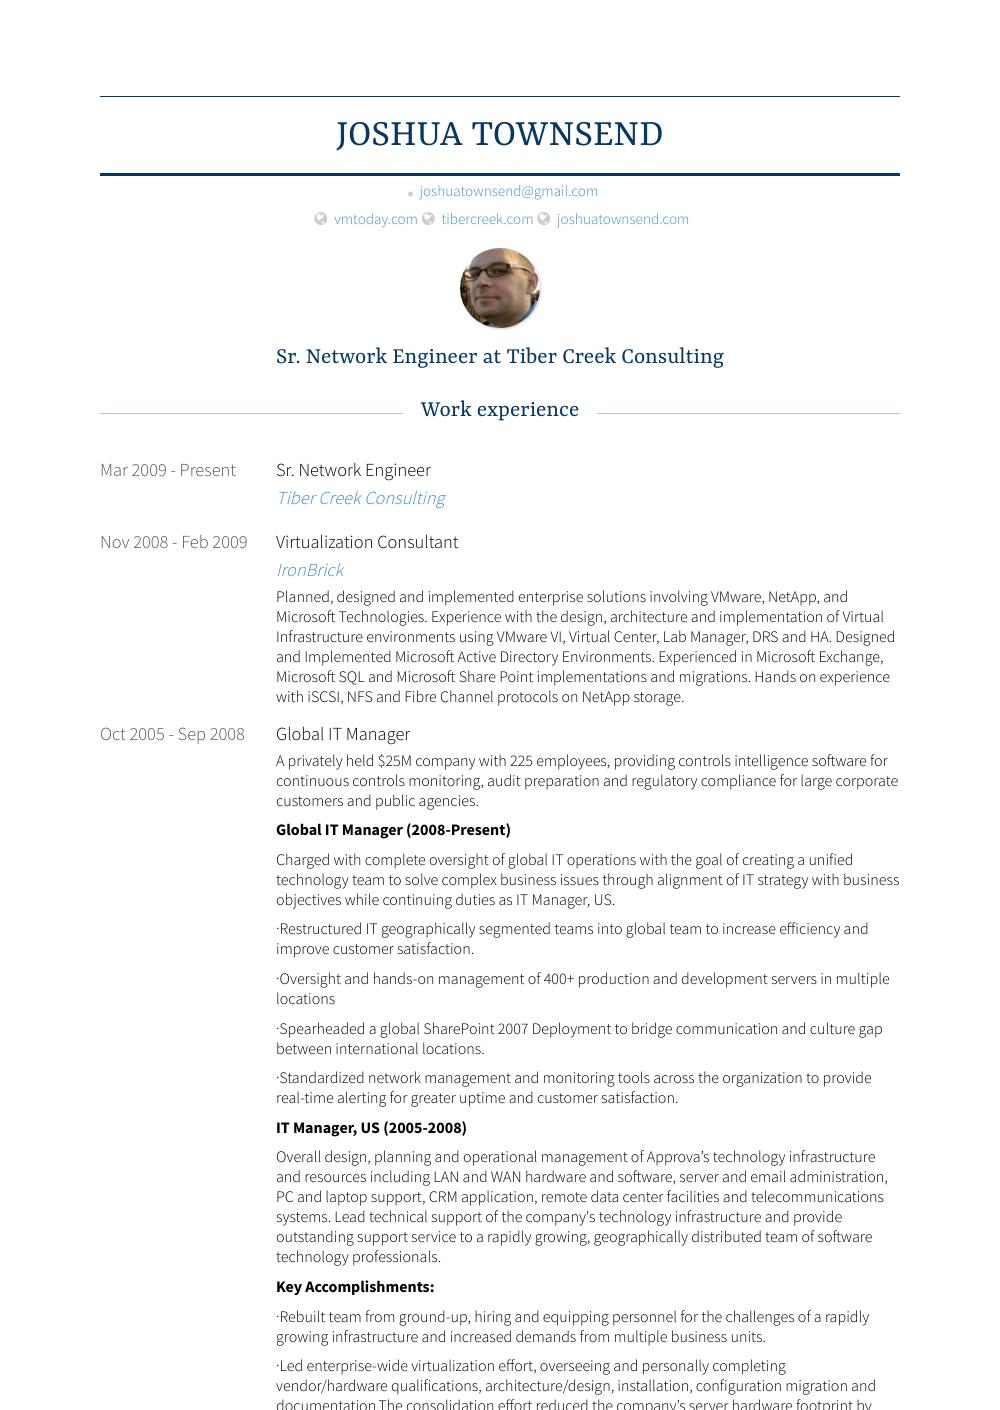 Sr. Network Engineer Resume Sample